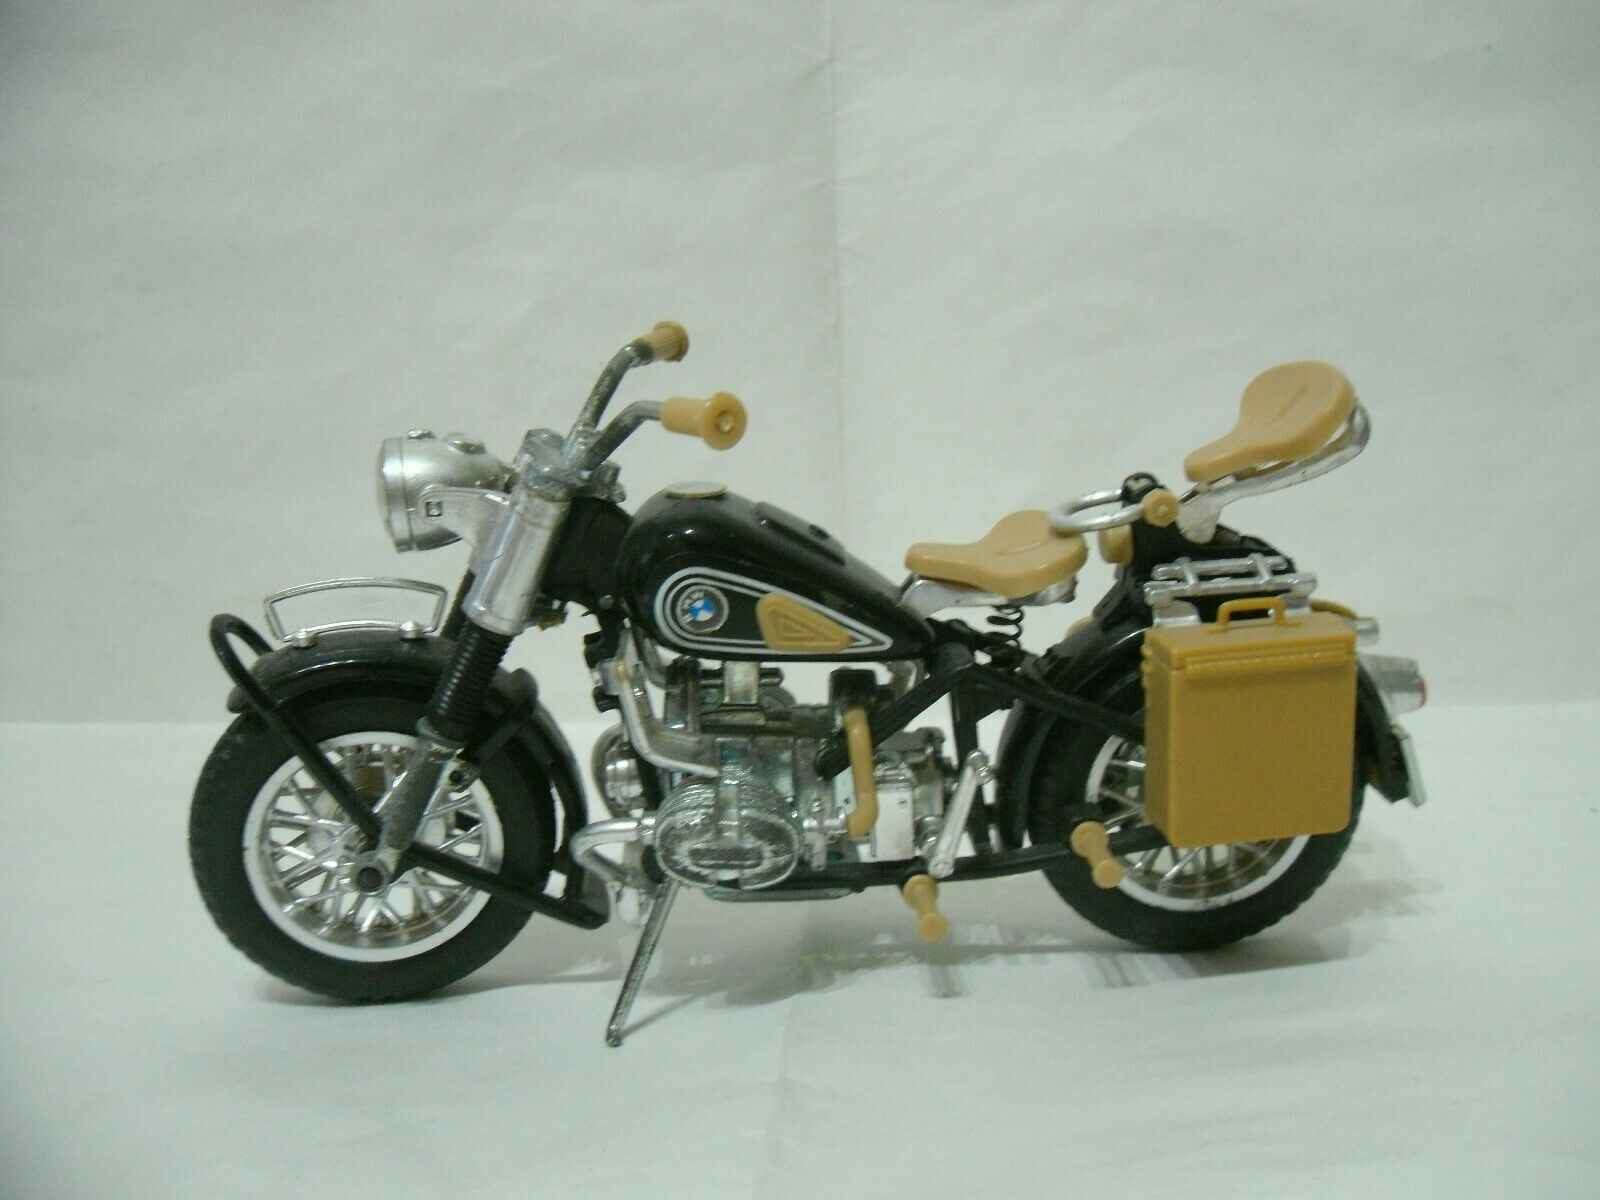 Moto Polistil anni 70 serie MS scala 1 15, MS 637 BMW R75 Elephant vintage